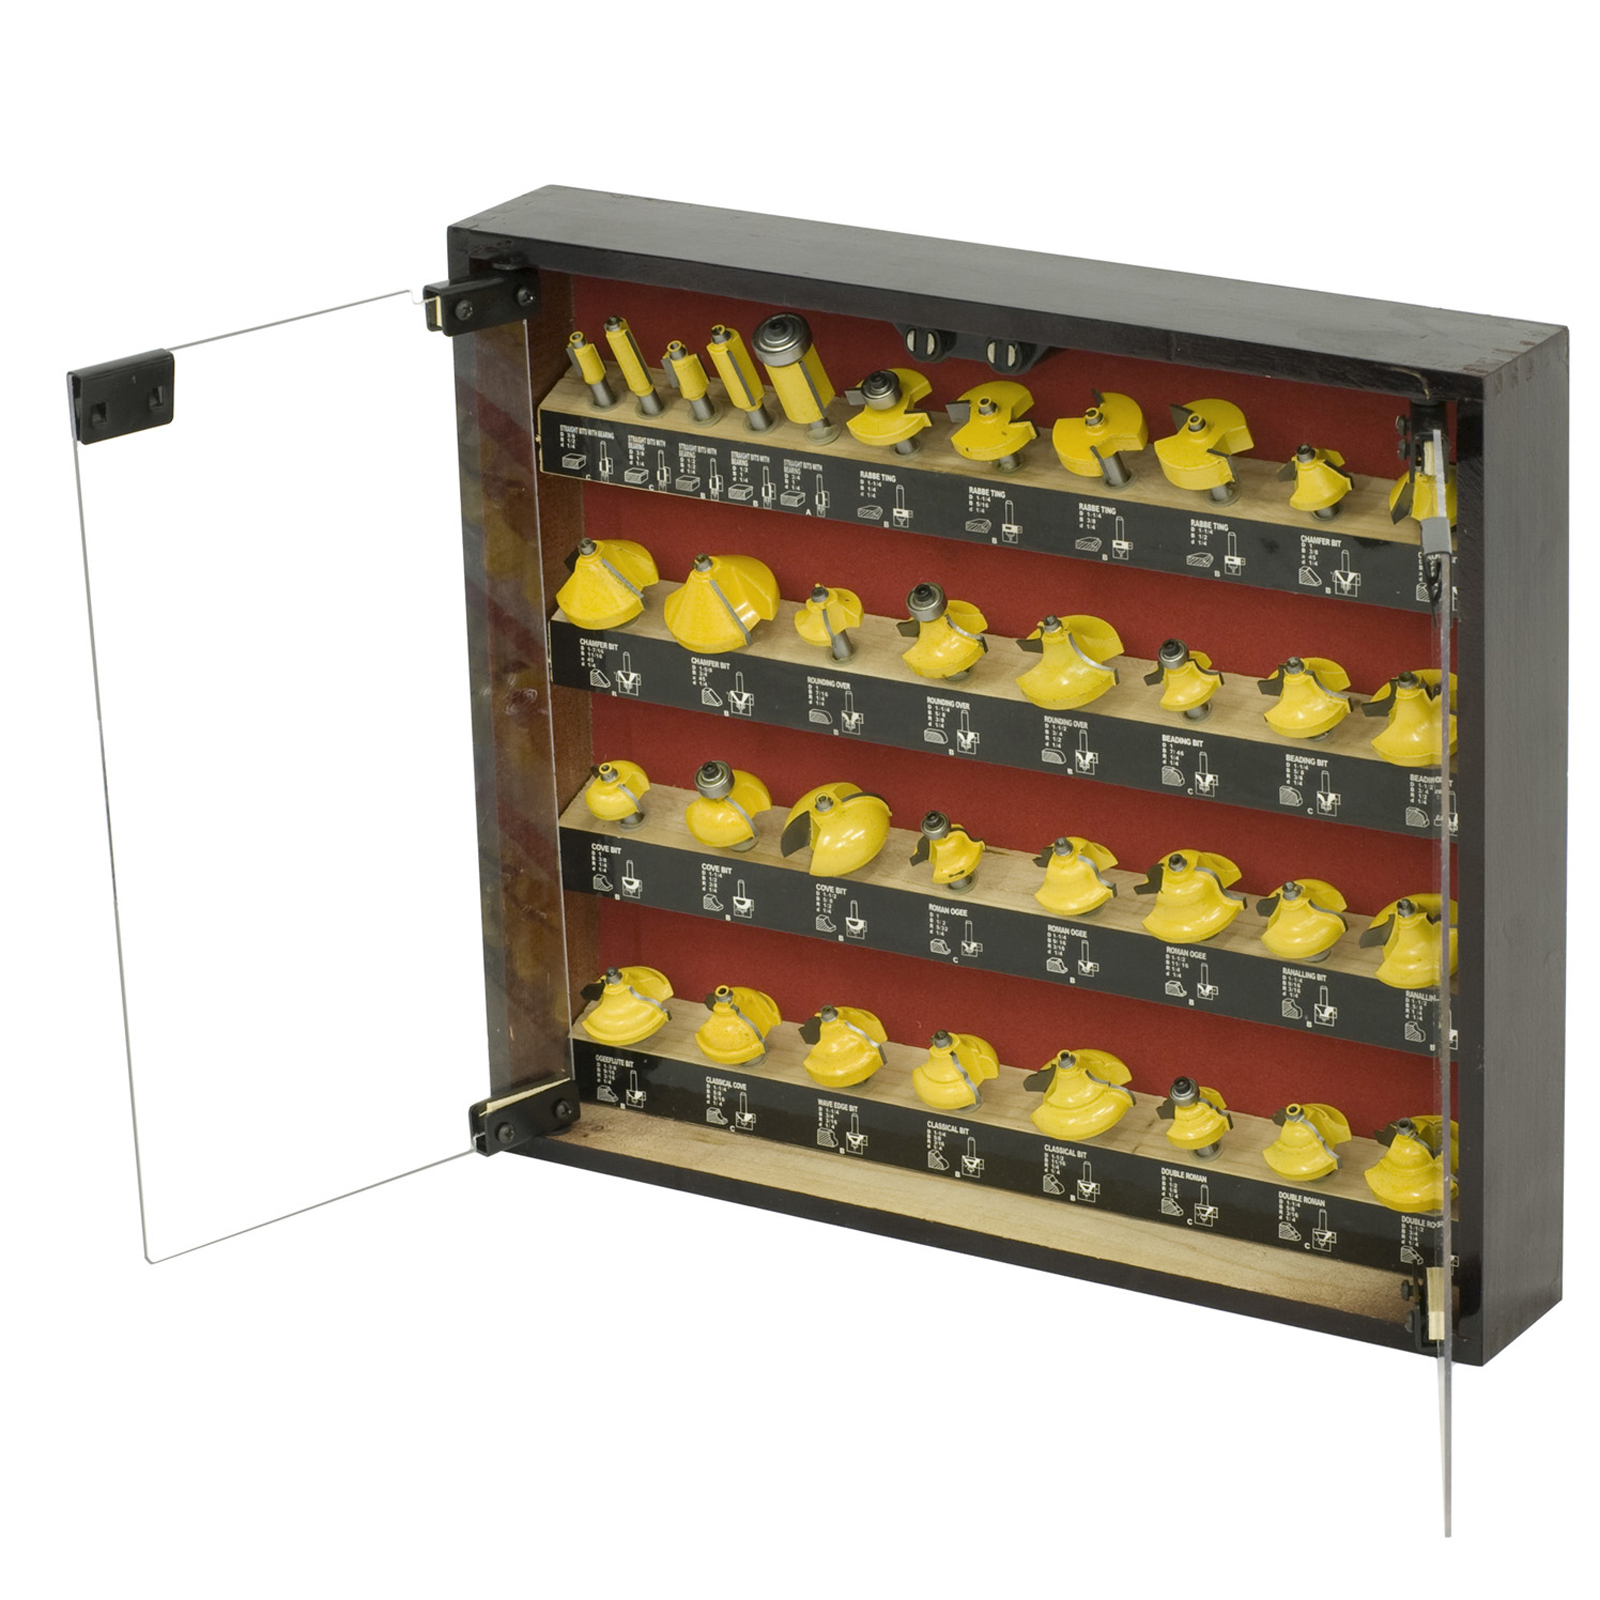 Professional Woodworker 35 Piece Router Bit Set by NATI LLC